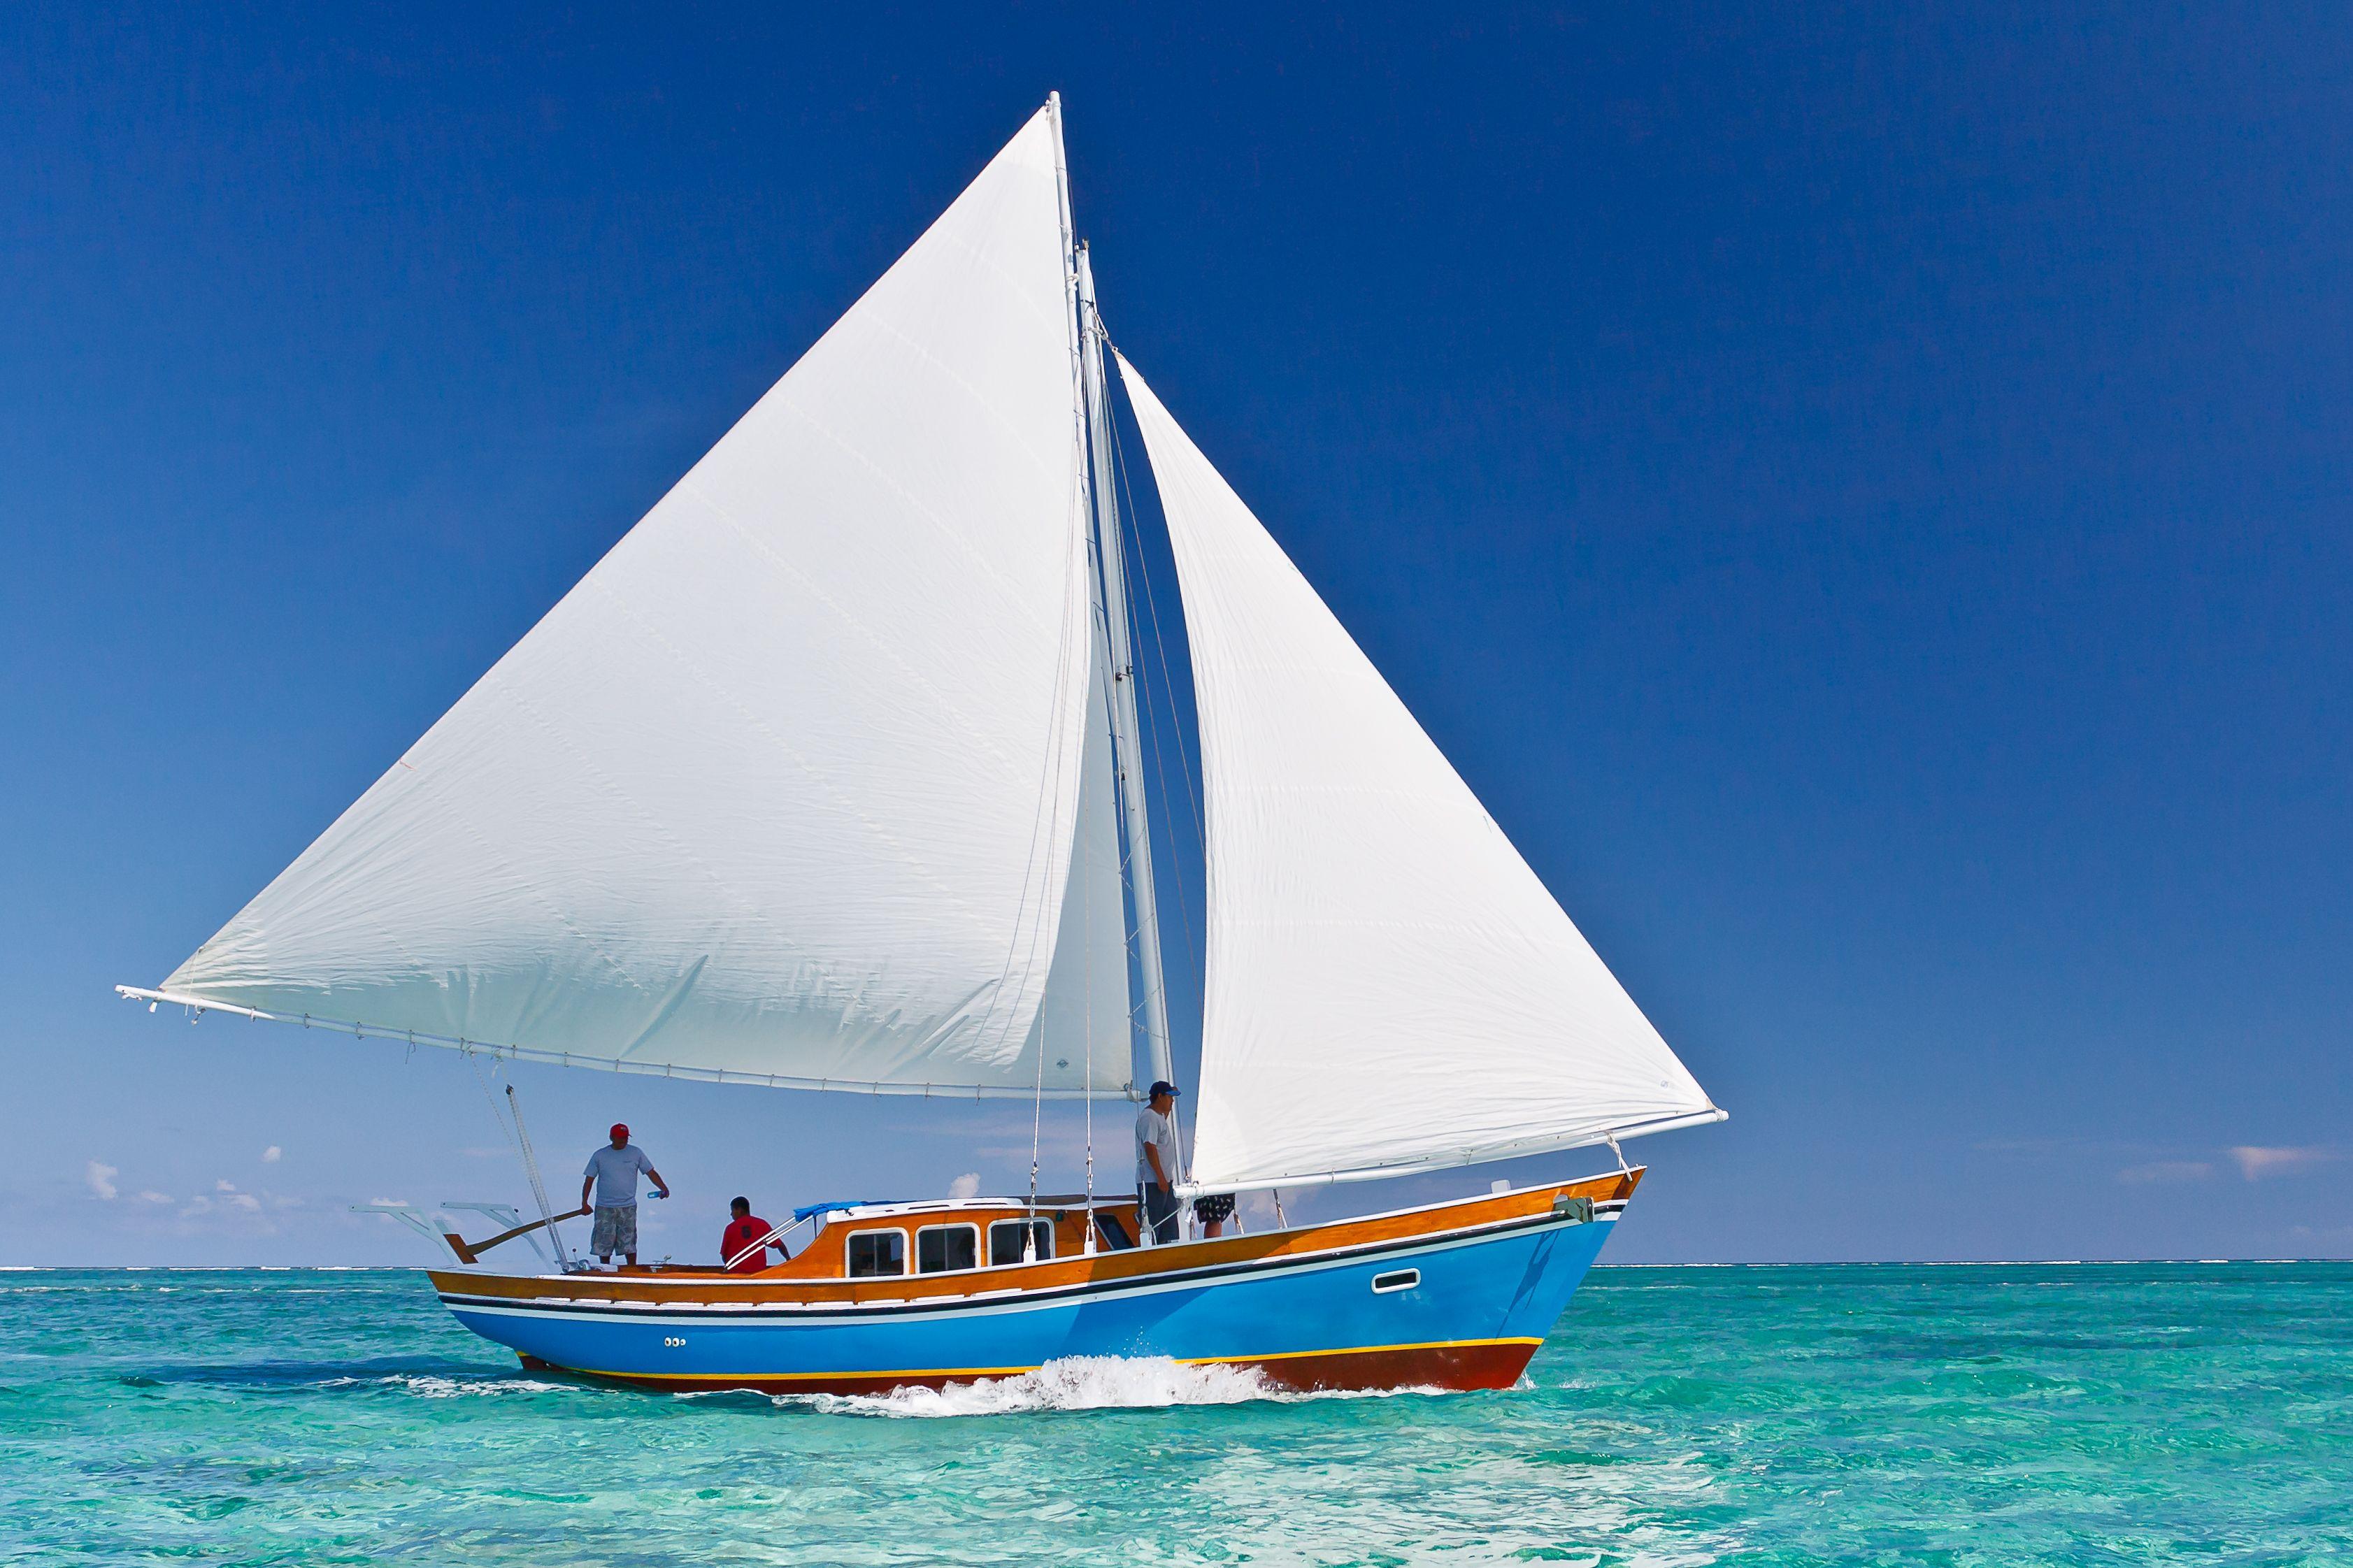 3365x2243 > Sailboat Wallpapers